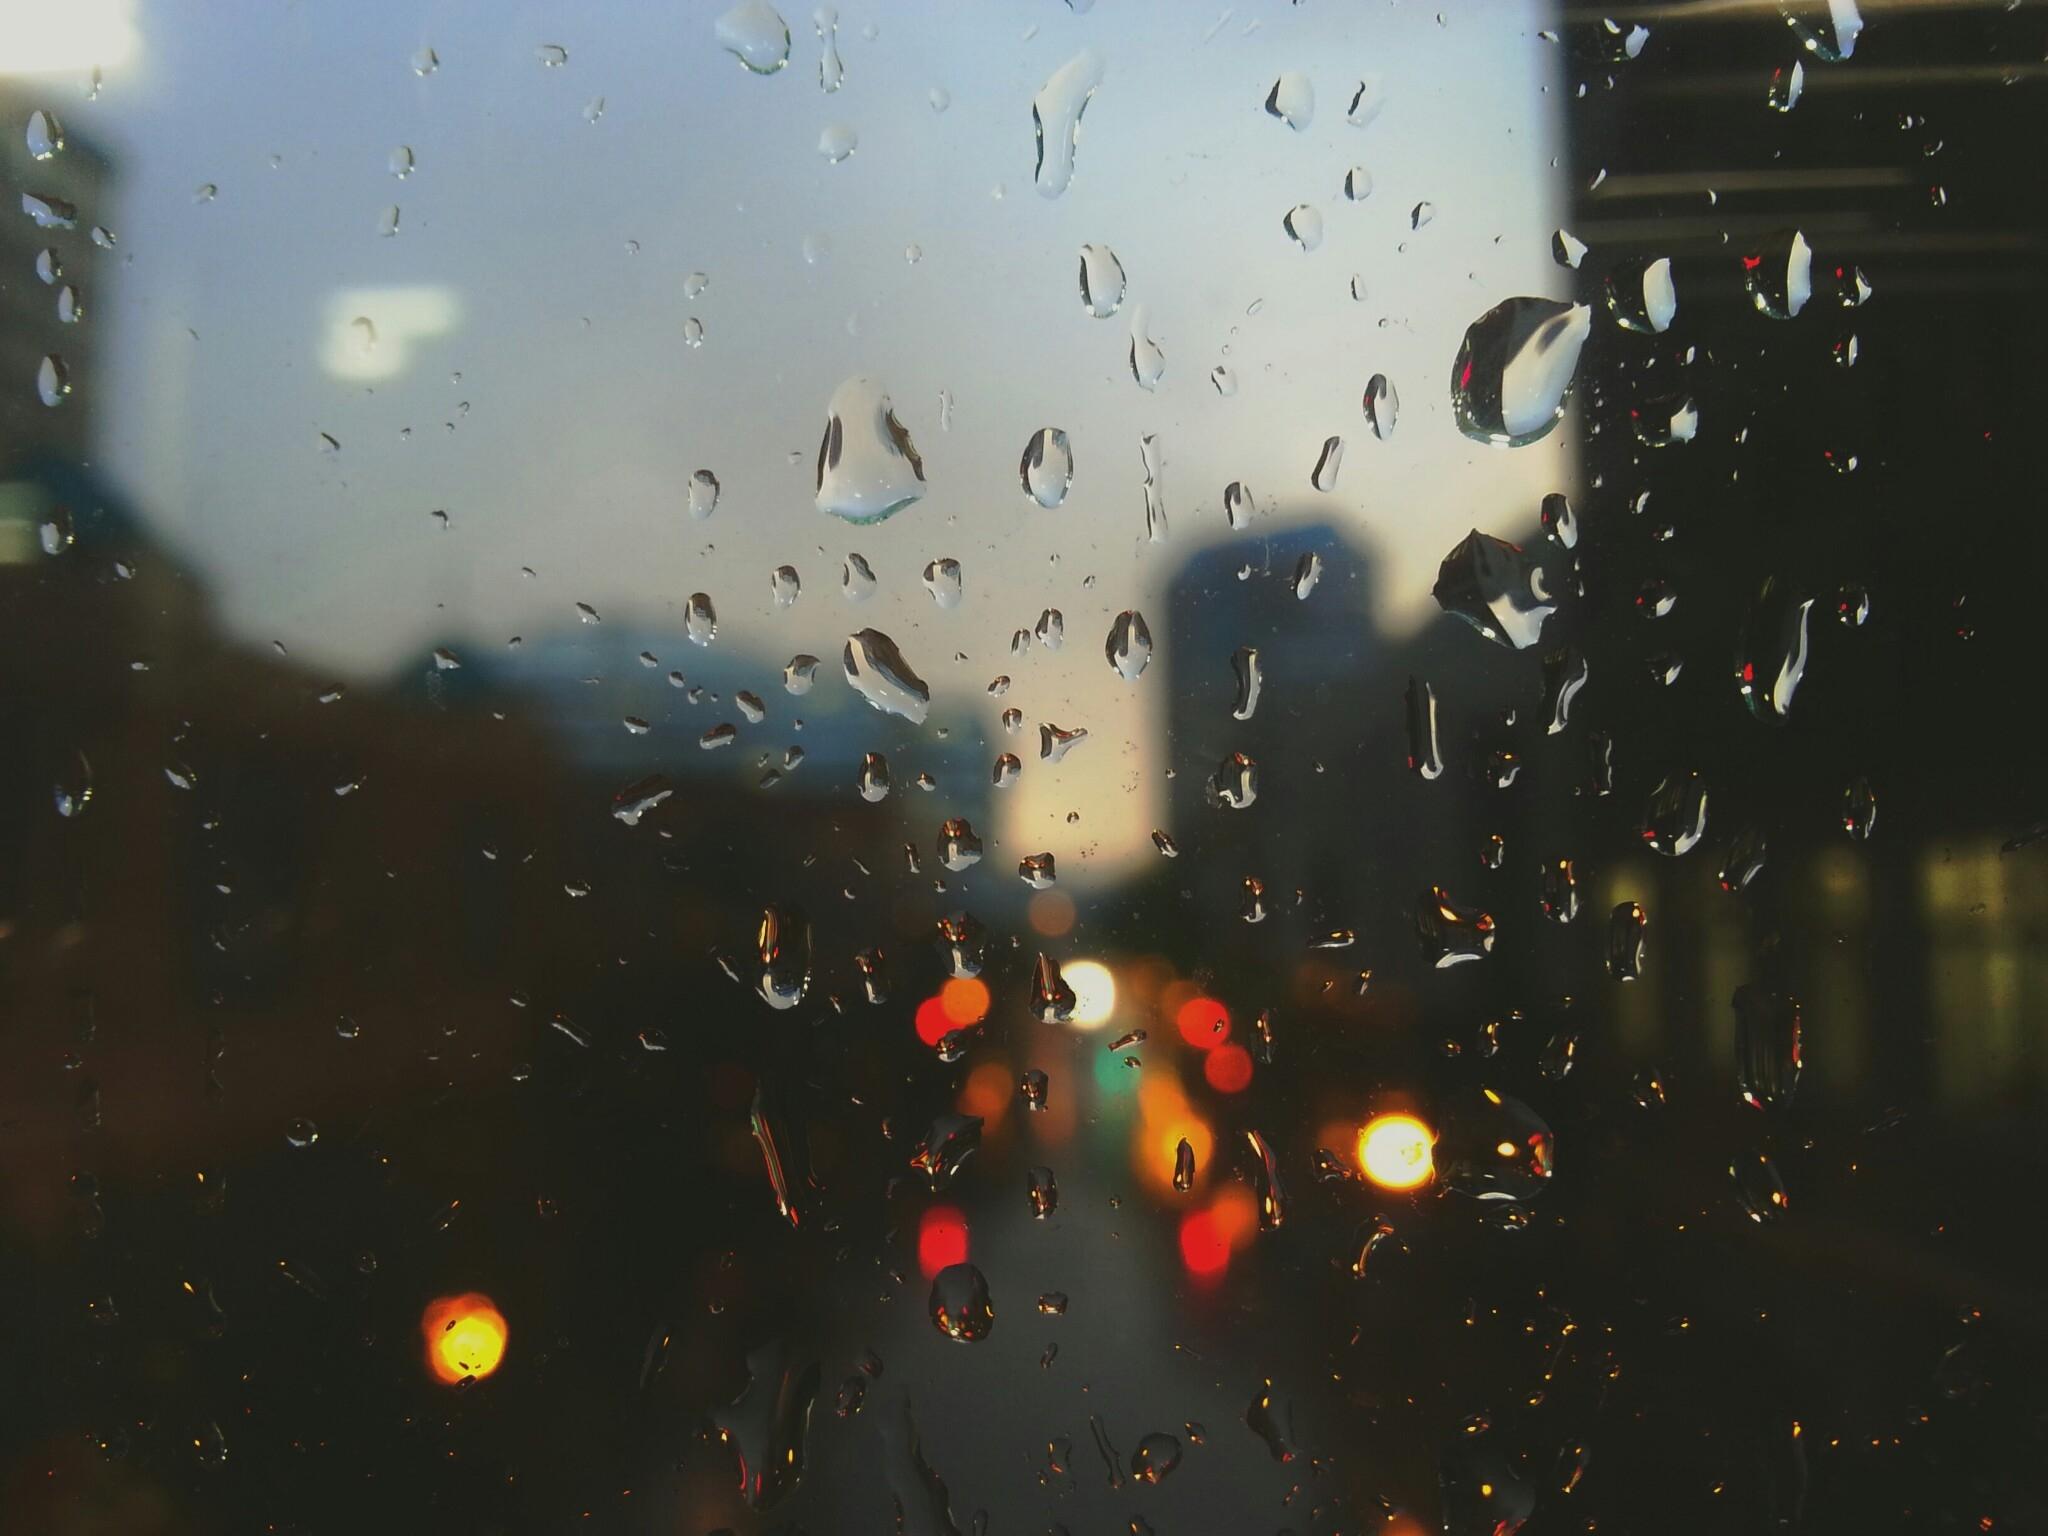 Imagen de gotas de lluvia en un vidrio